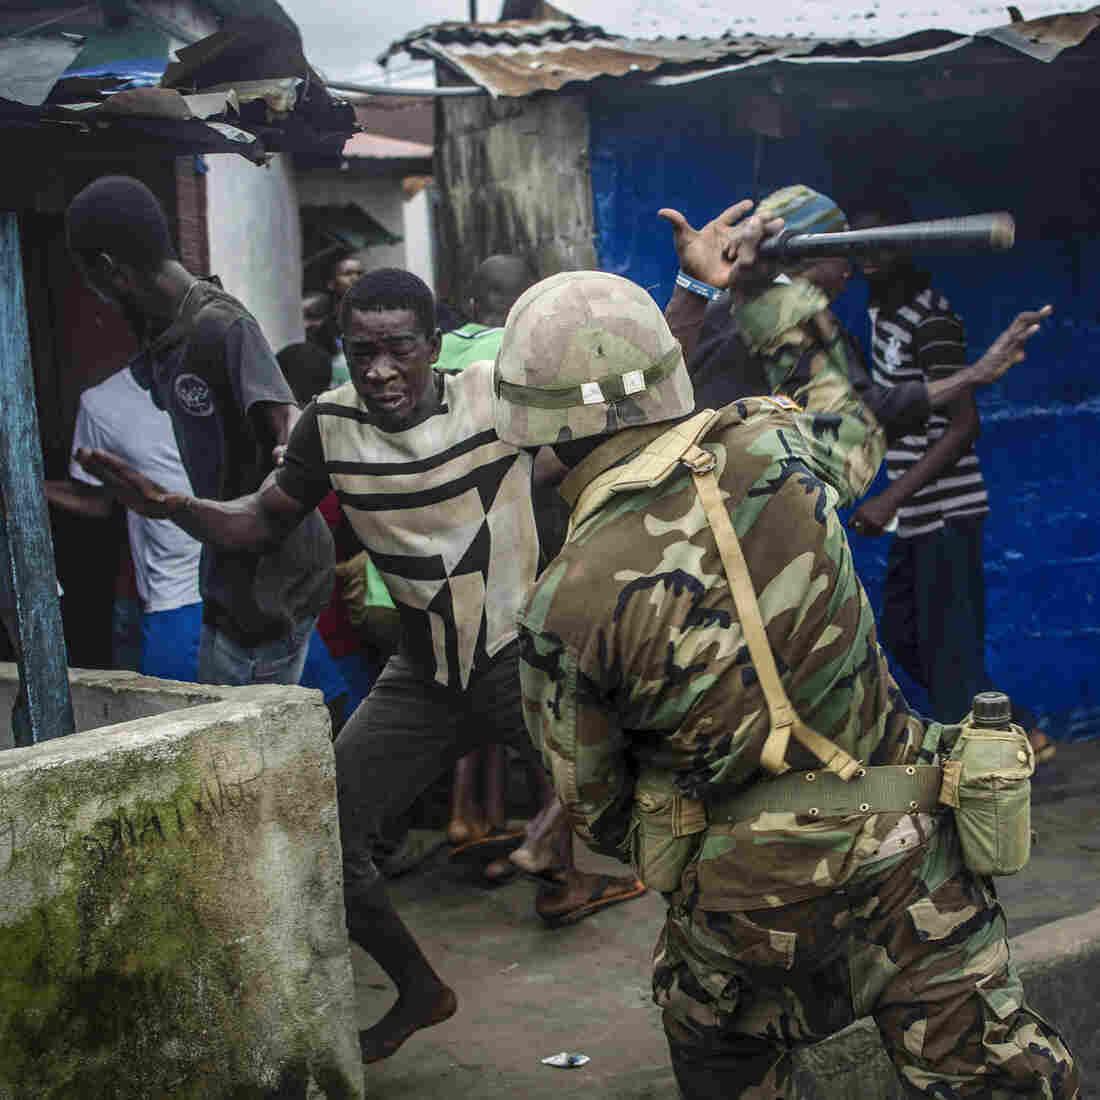 An Ebola Quarantine Triggers A Riot In A Liberian Slum